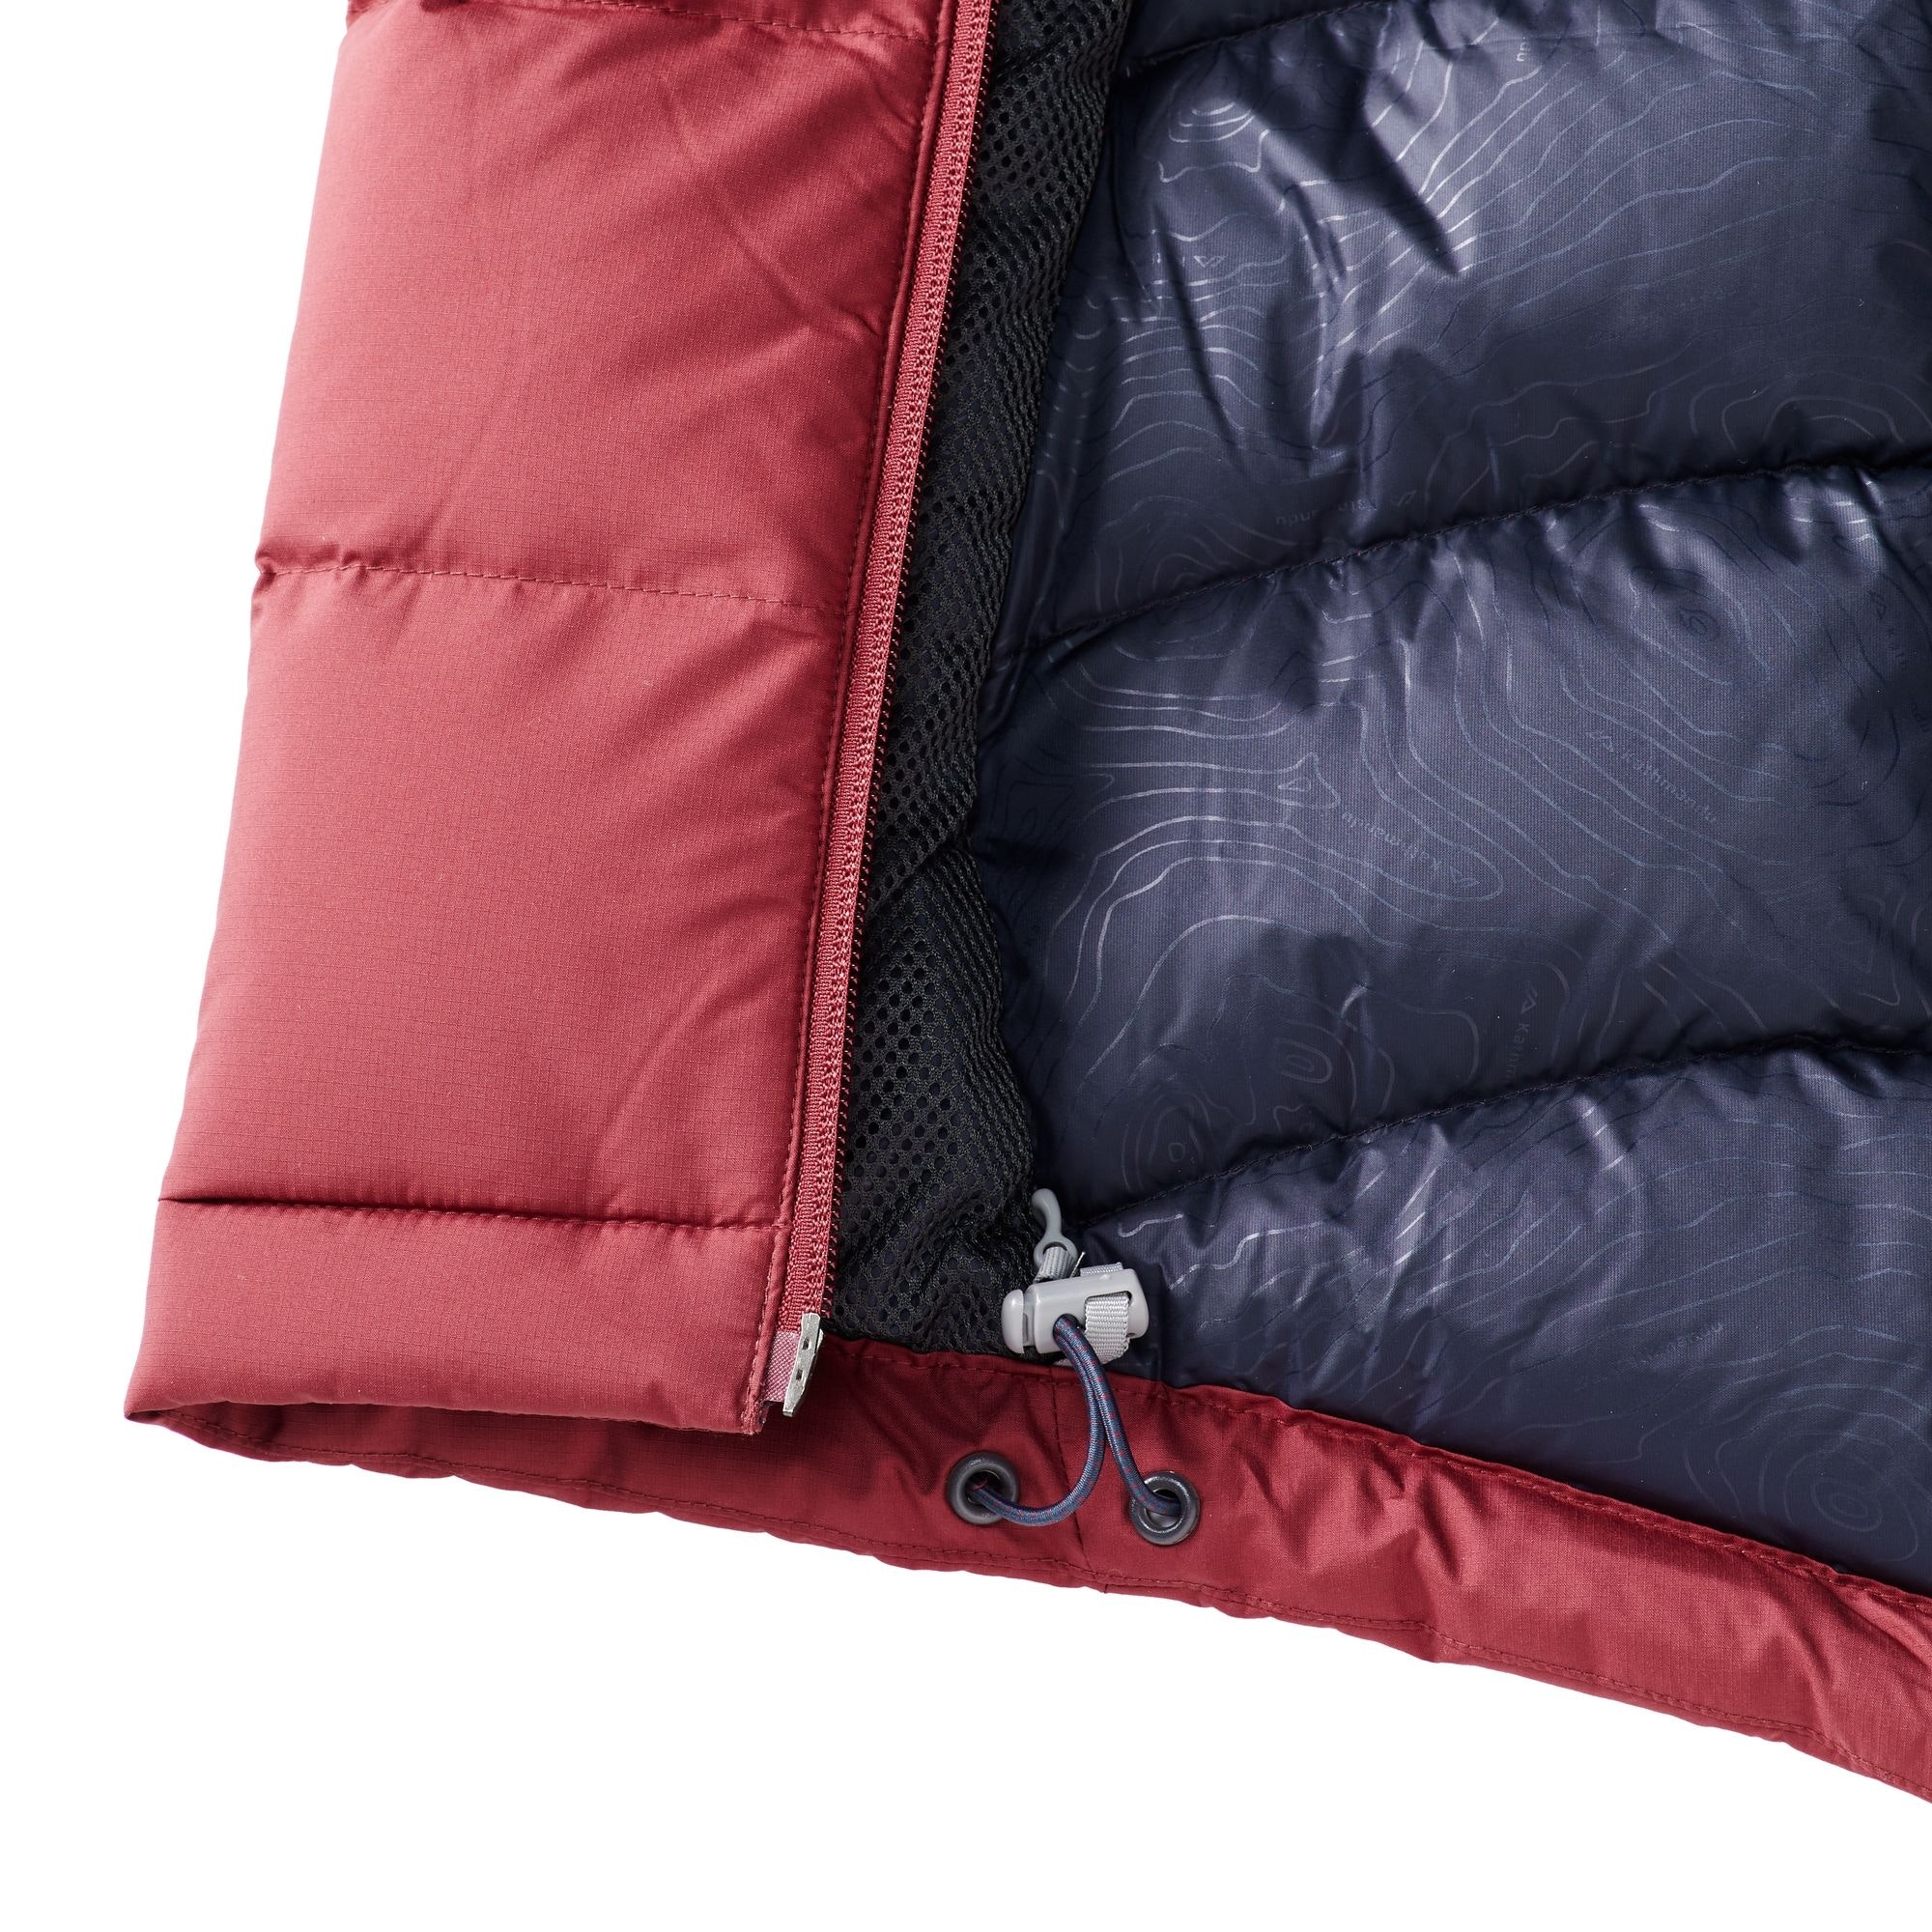 NEW-Kathmandu-Epiq-Men-039-s-Hooded-Warm-Winter-Duck-Down-Puffer-Jacket-v2 thumbnail 32